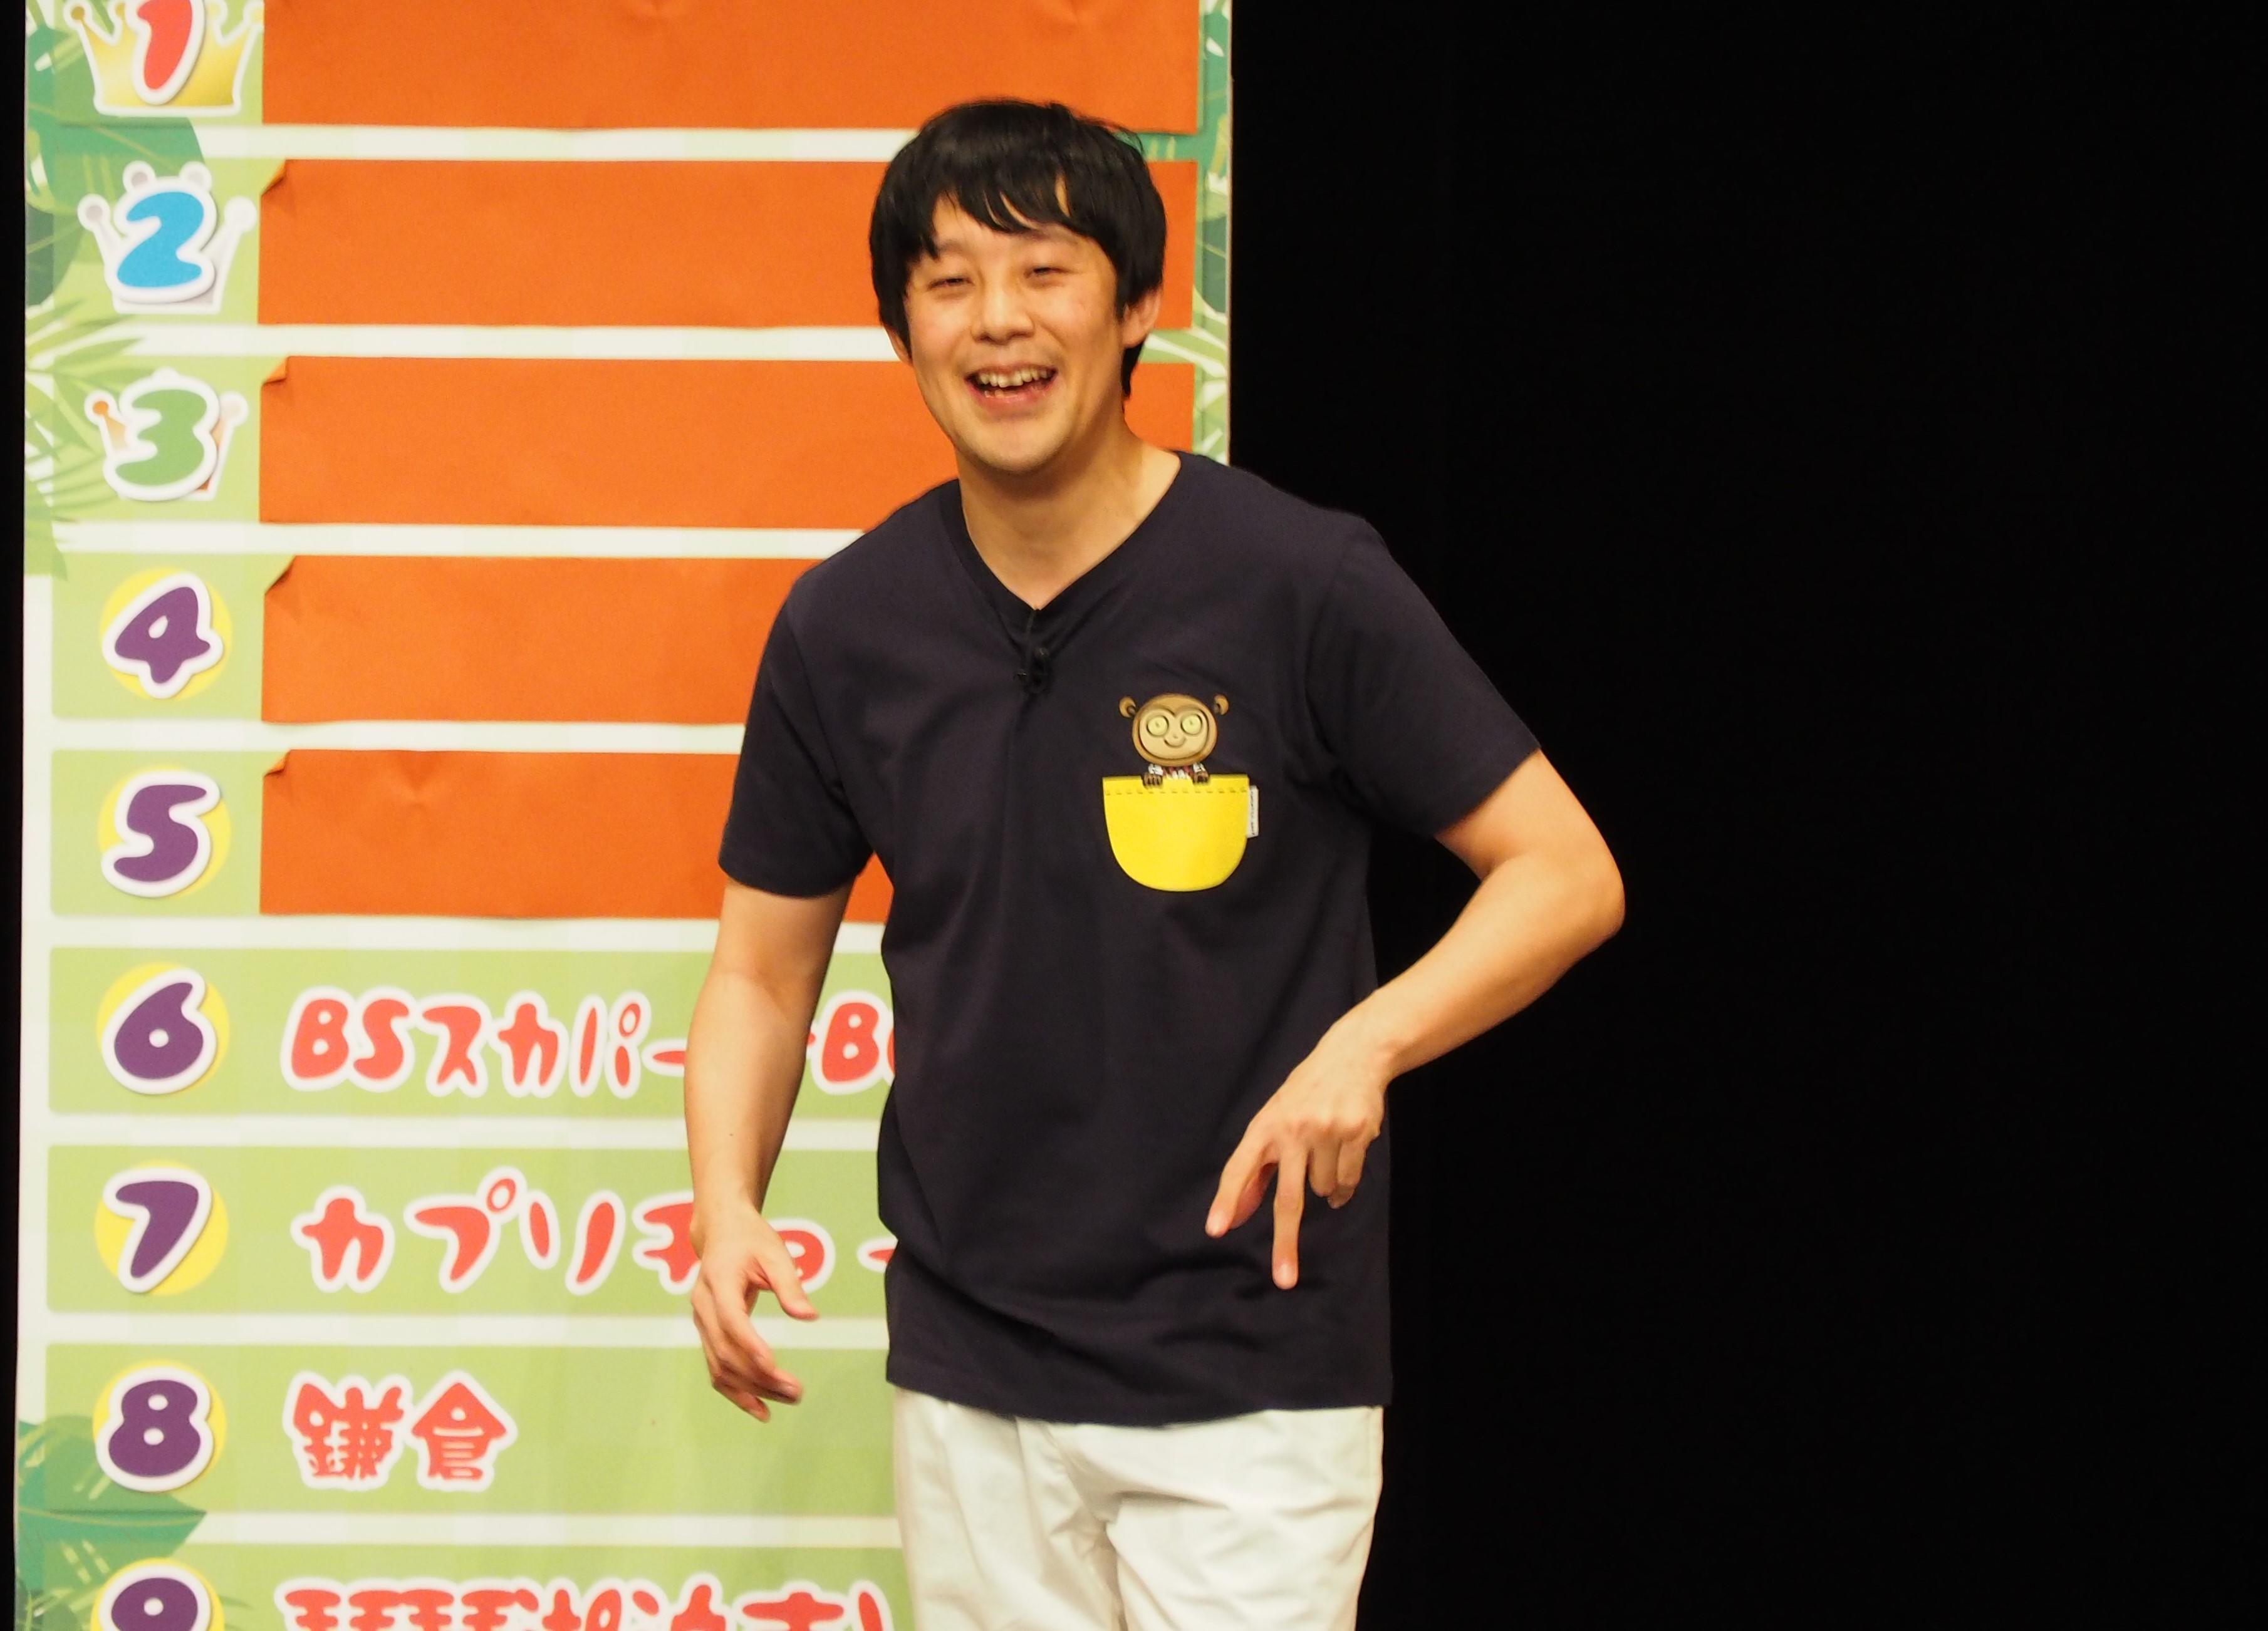 http://news.yoshimoto.co.jp/20171230201456-f8d62ebb218487bb6fb9091004d36f69f9c404ed.jpg